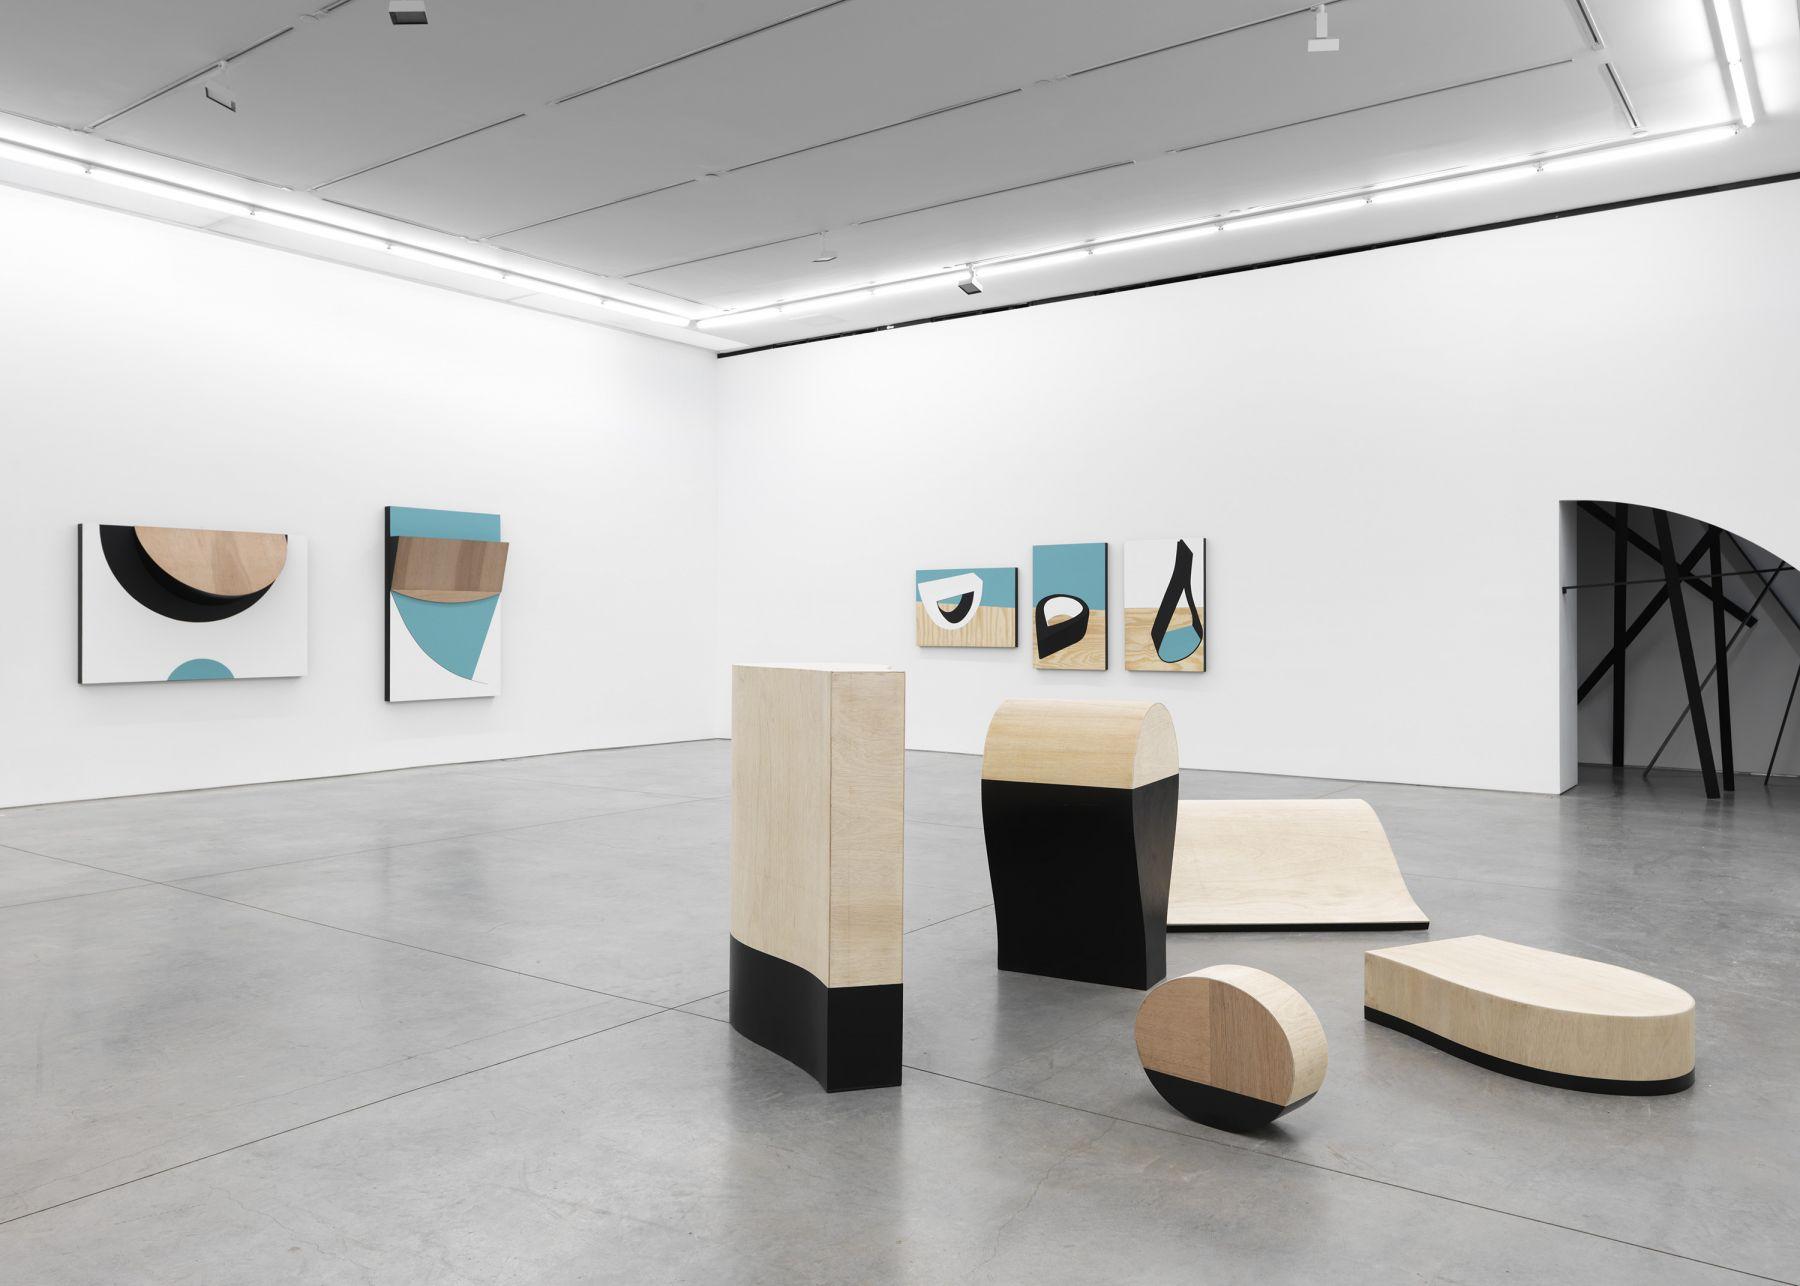 sculpture and artwork by serge alain nitegeka in a gallery